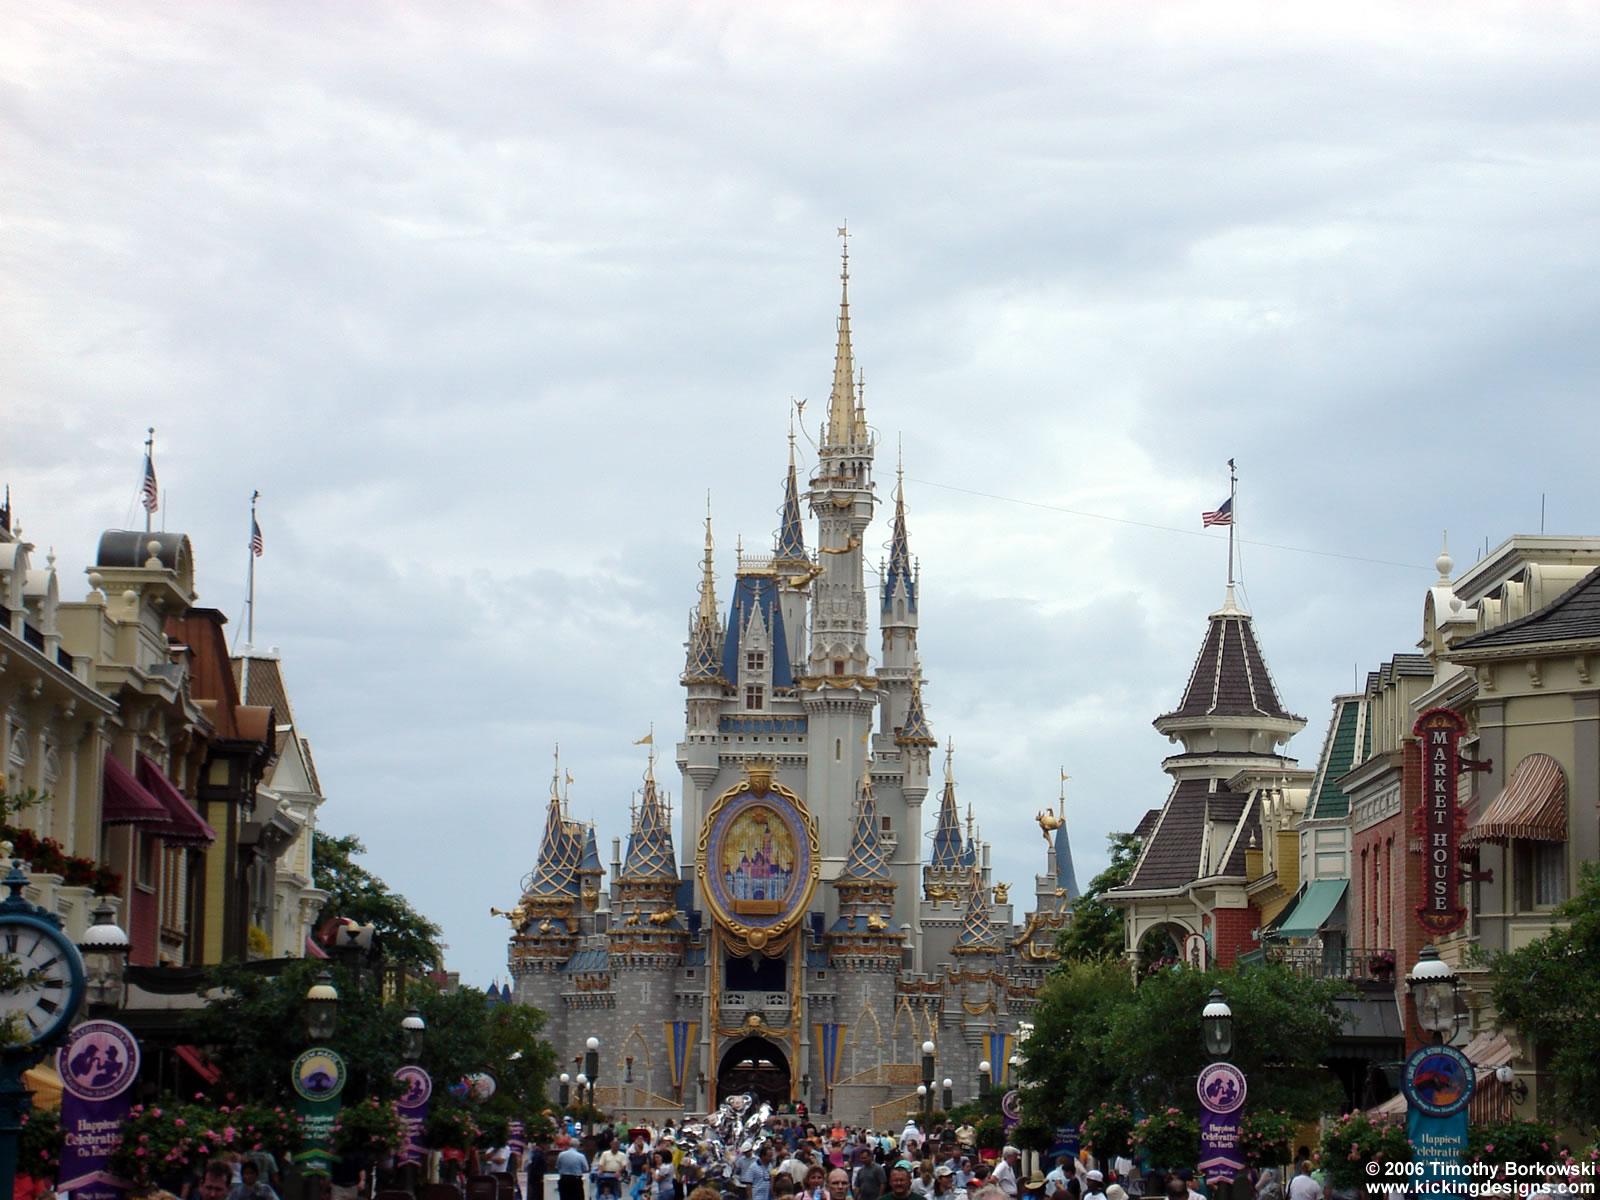 magic kingdom 03 magic kingdom 02 magic kingdom 01 1600x1200